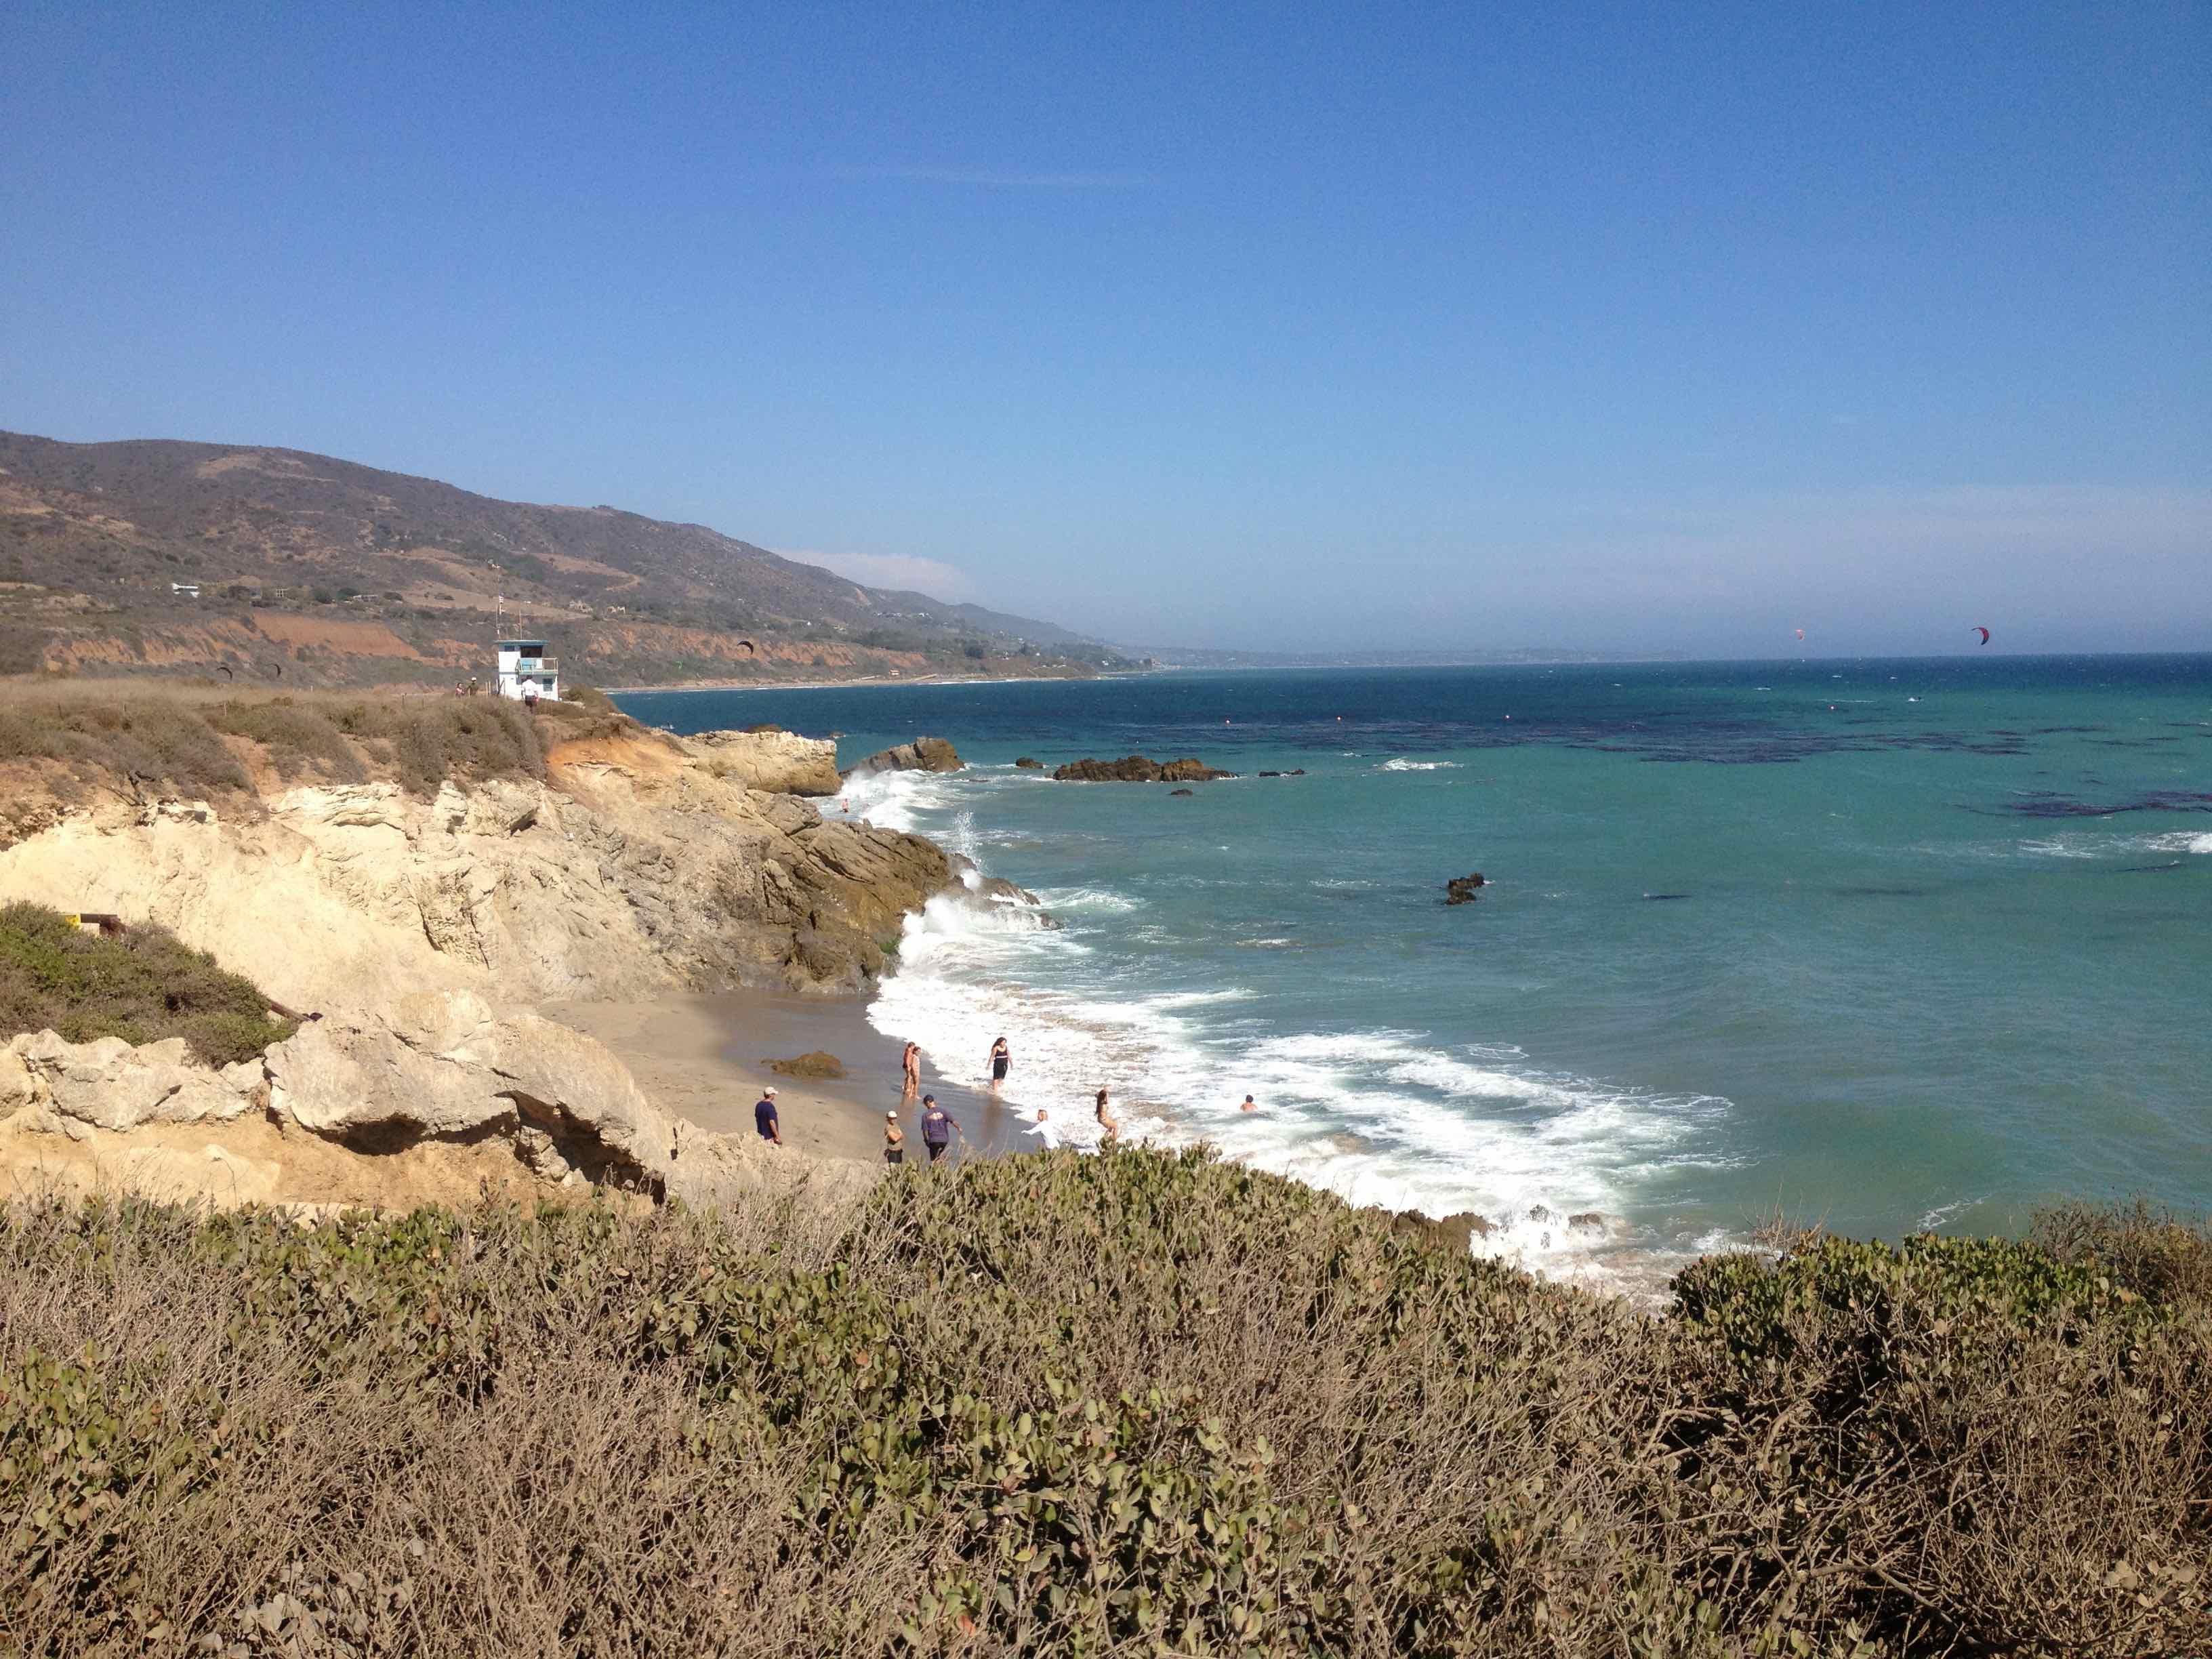 Leo Carrillo State Beach Surf